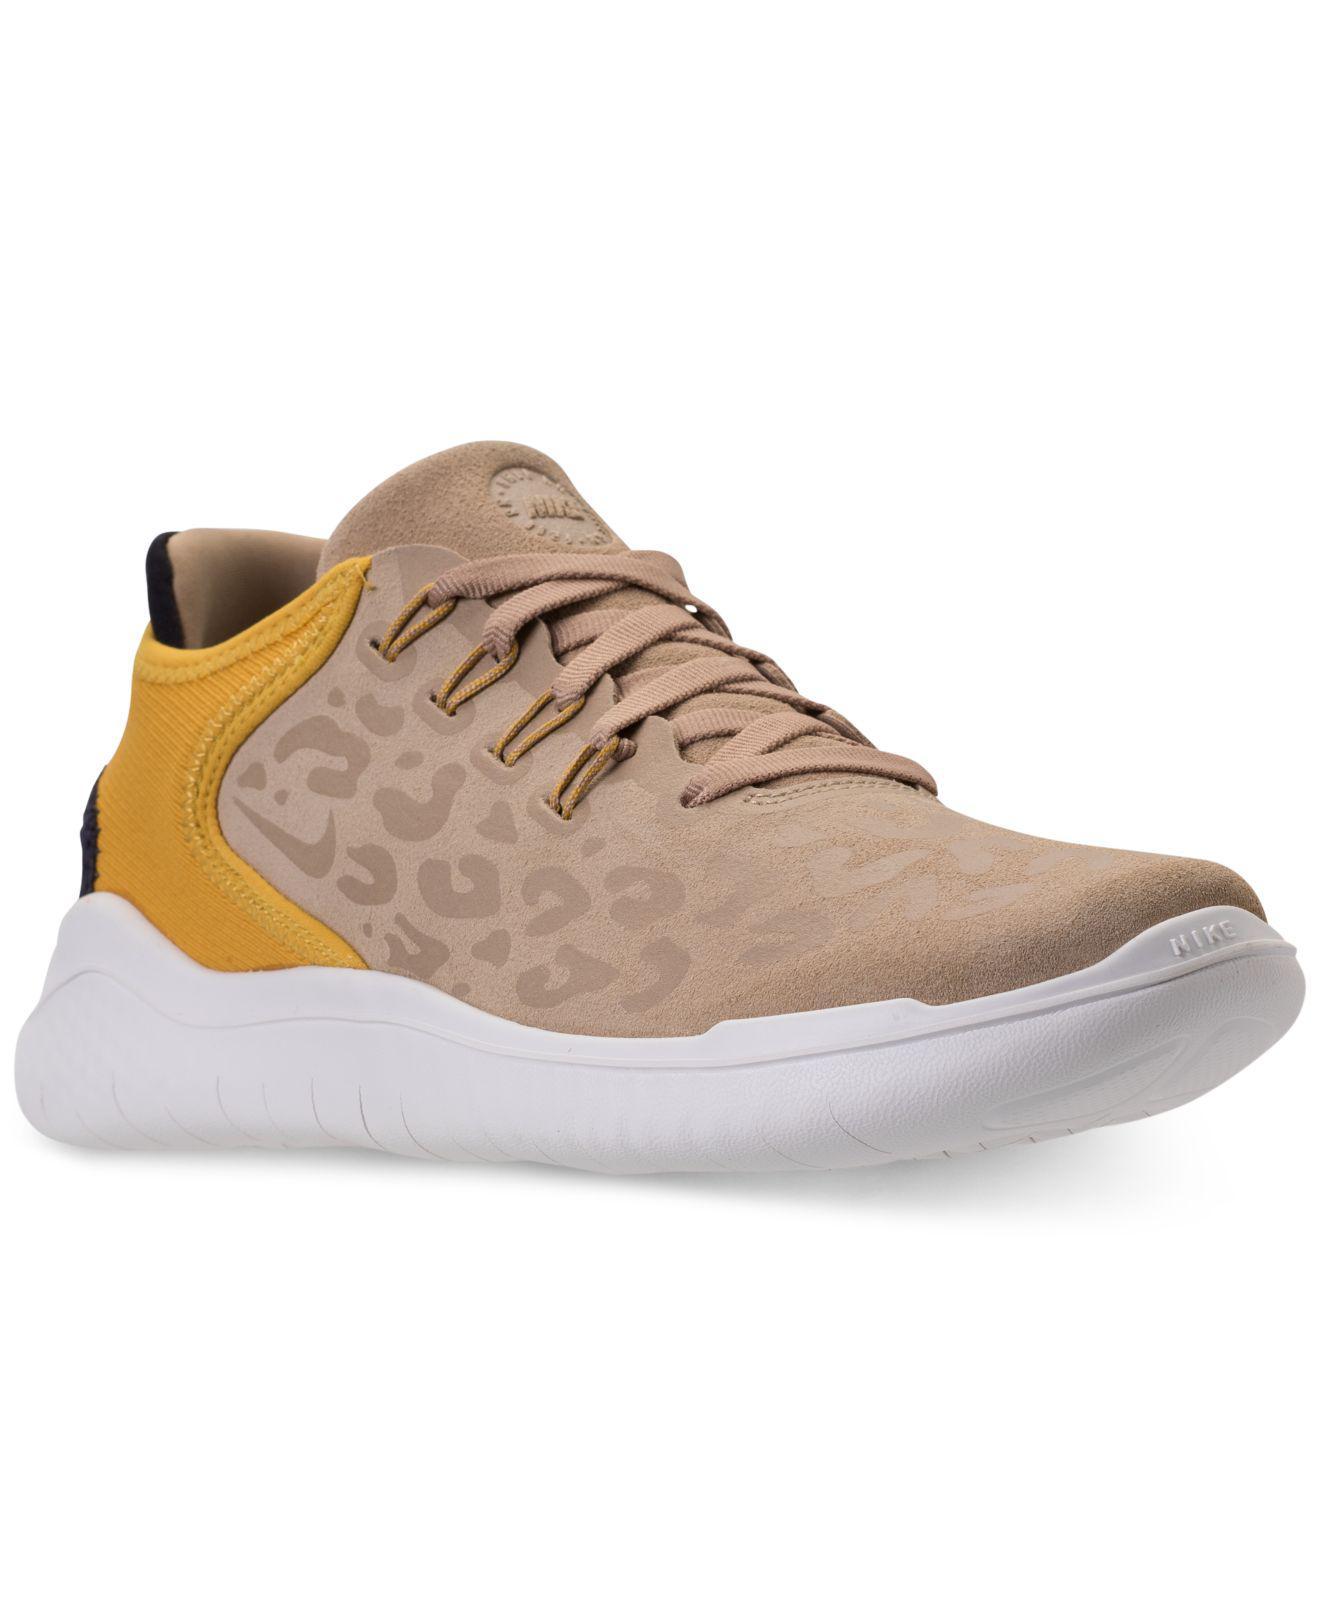 Nike. Women's Gray Free Rn 2018 Wild Suede Running Sneakers ...